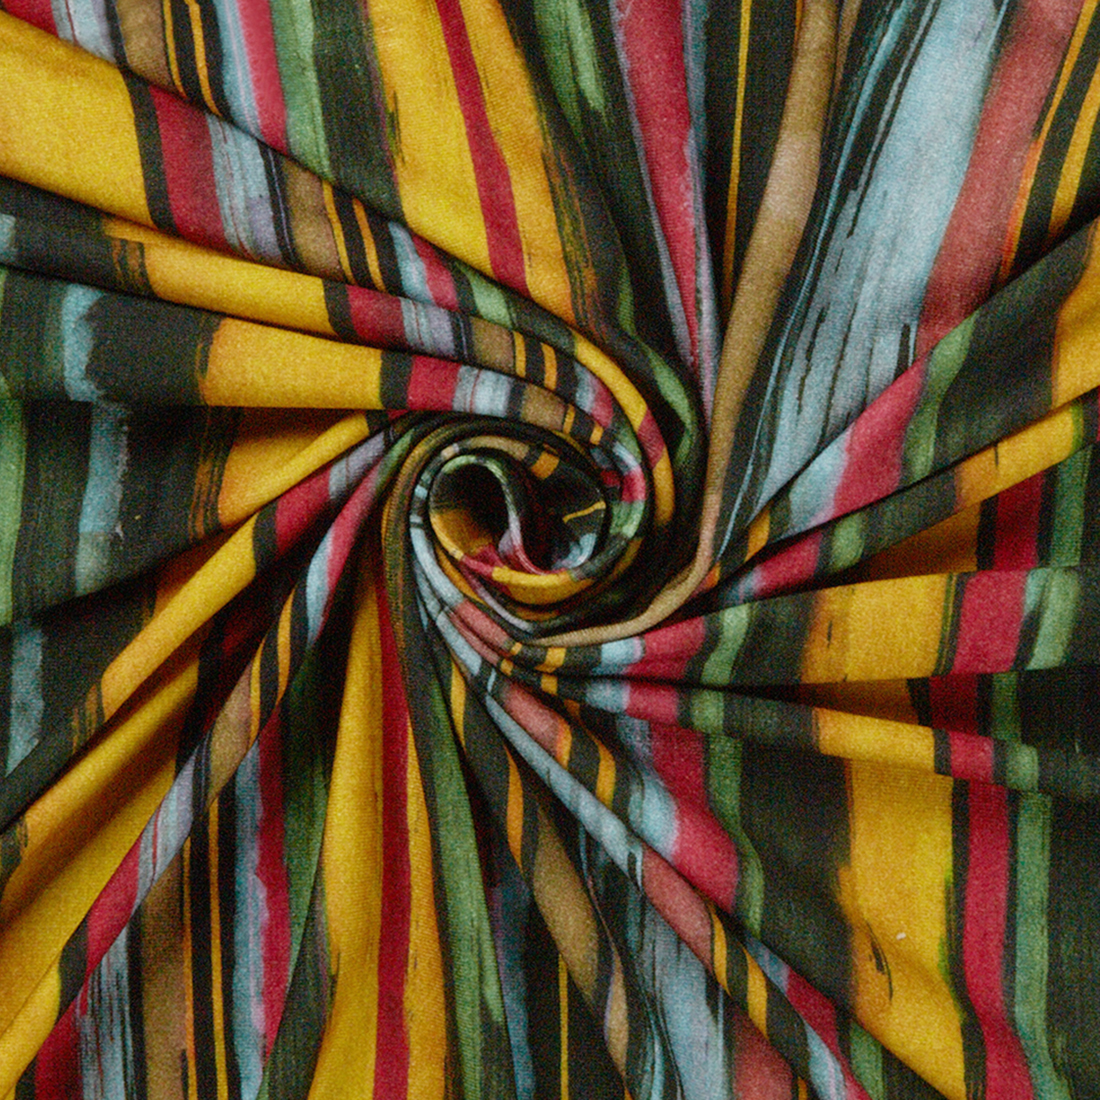 Sinharaja Stripe Multi Dress Fabric